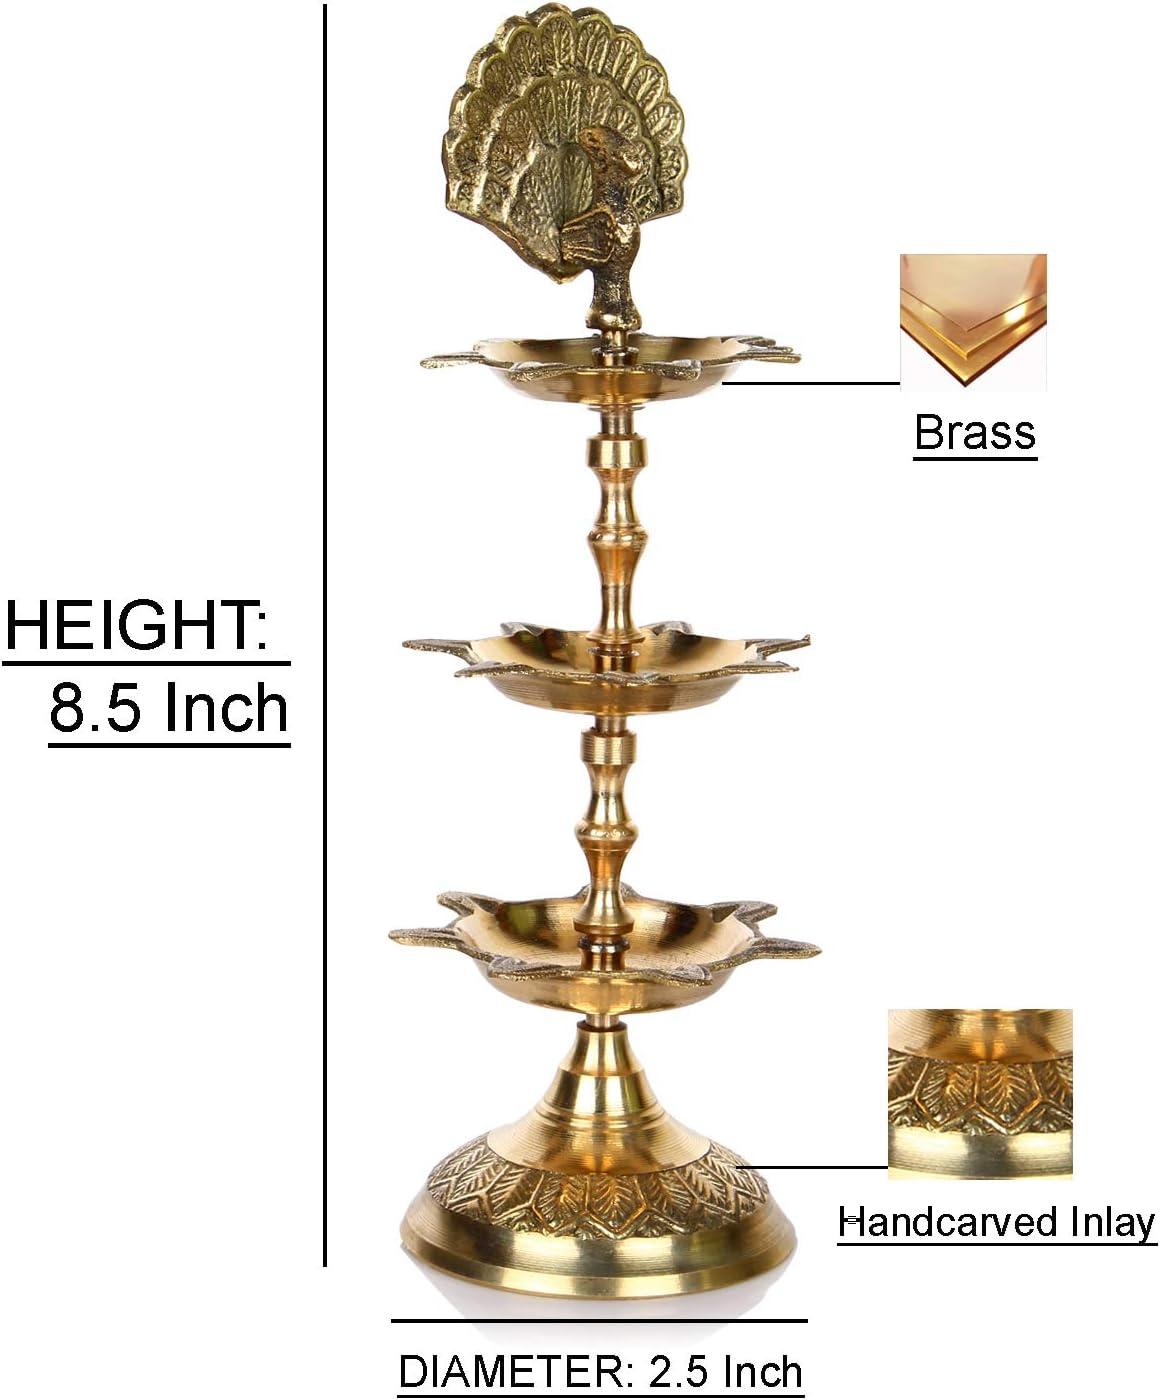 lampada ad olio realizzata e incisa a mano in ottone indiano Hashcart diya di PanchMahal 3/in 1/regolabile  Gold